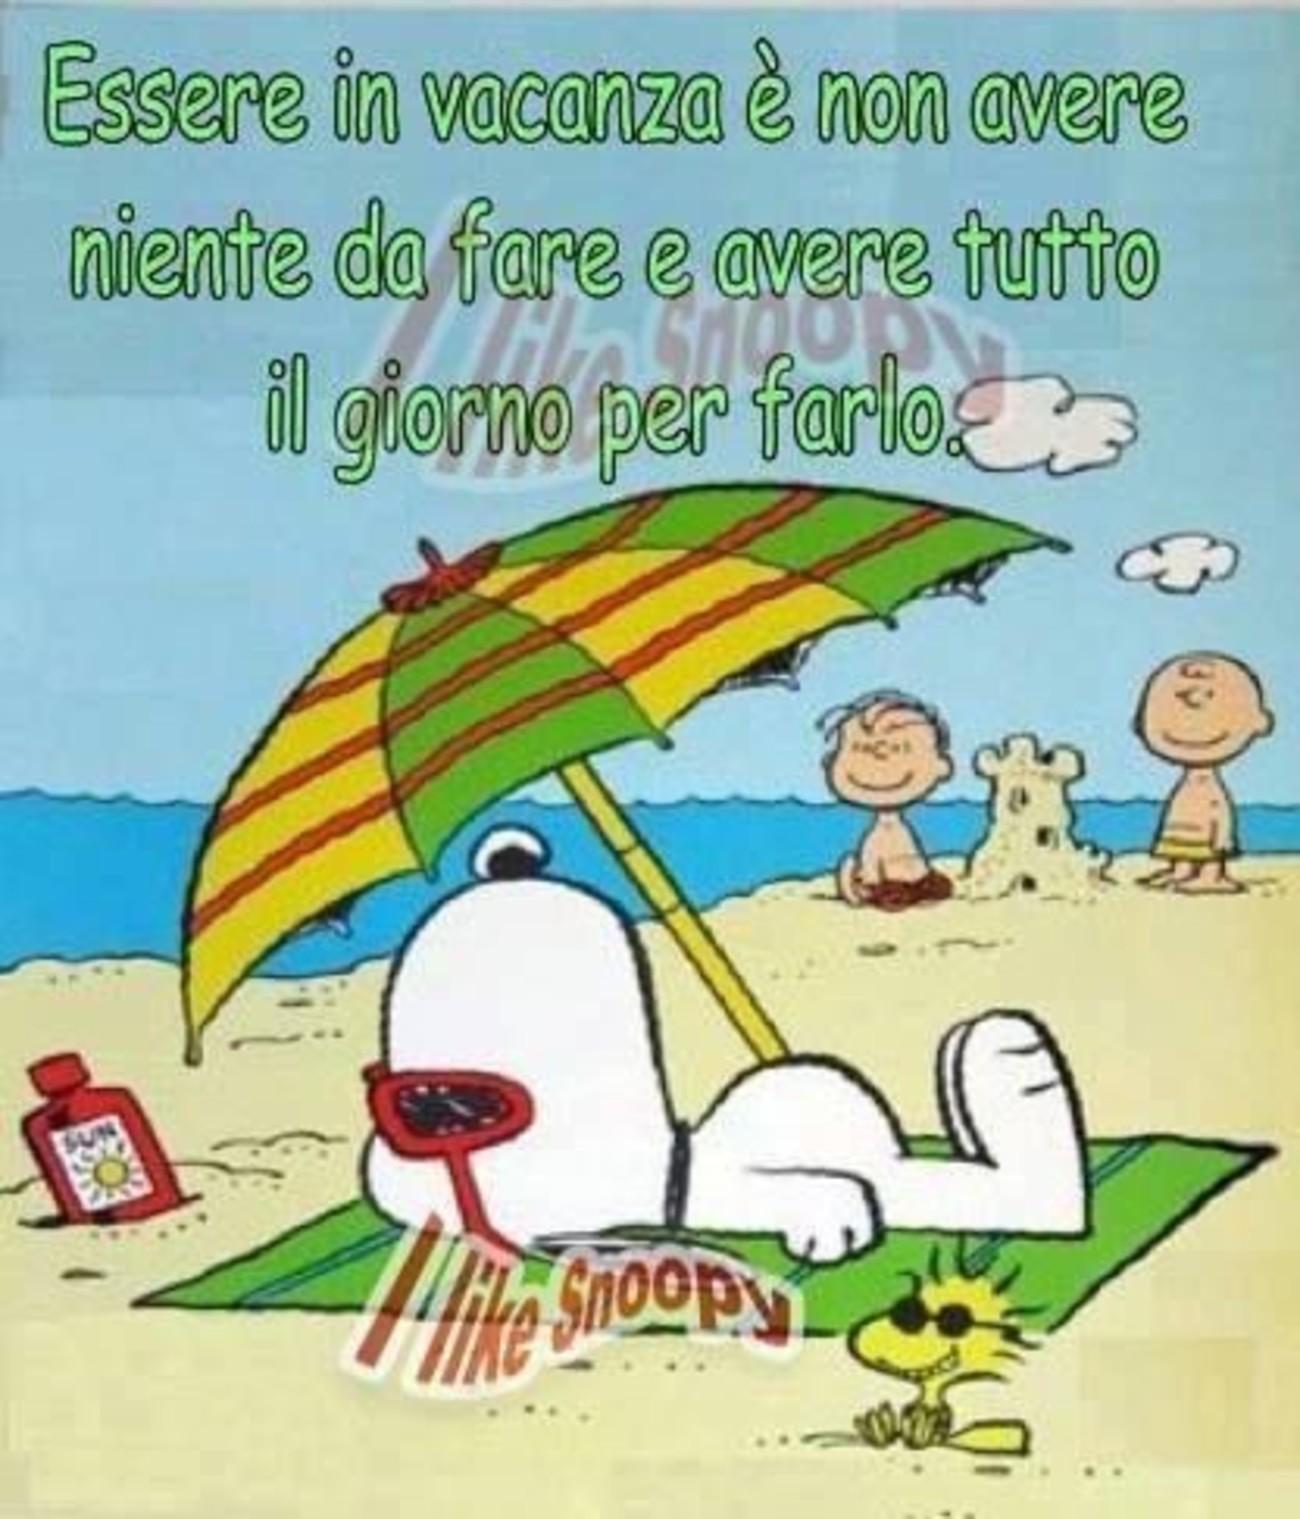 Vignette con Snoopy 3859